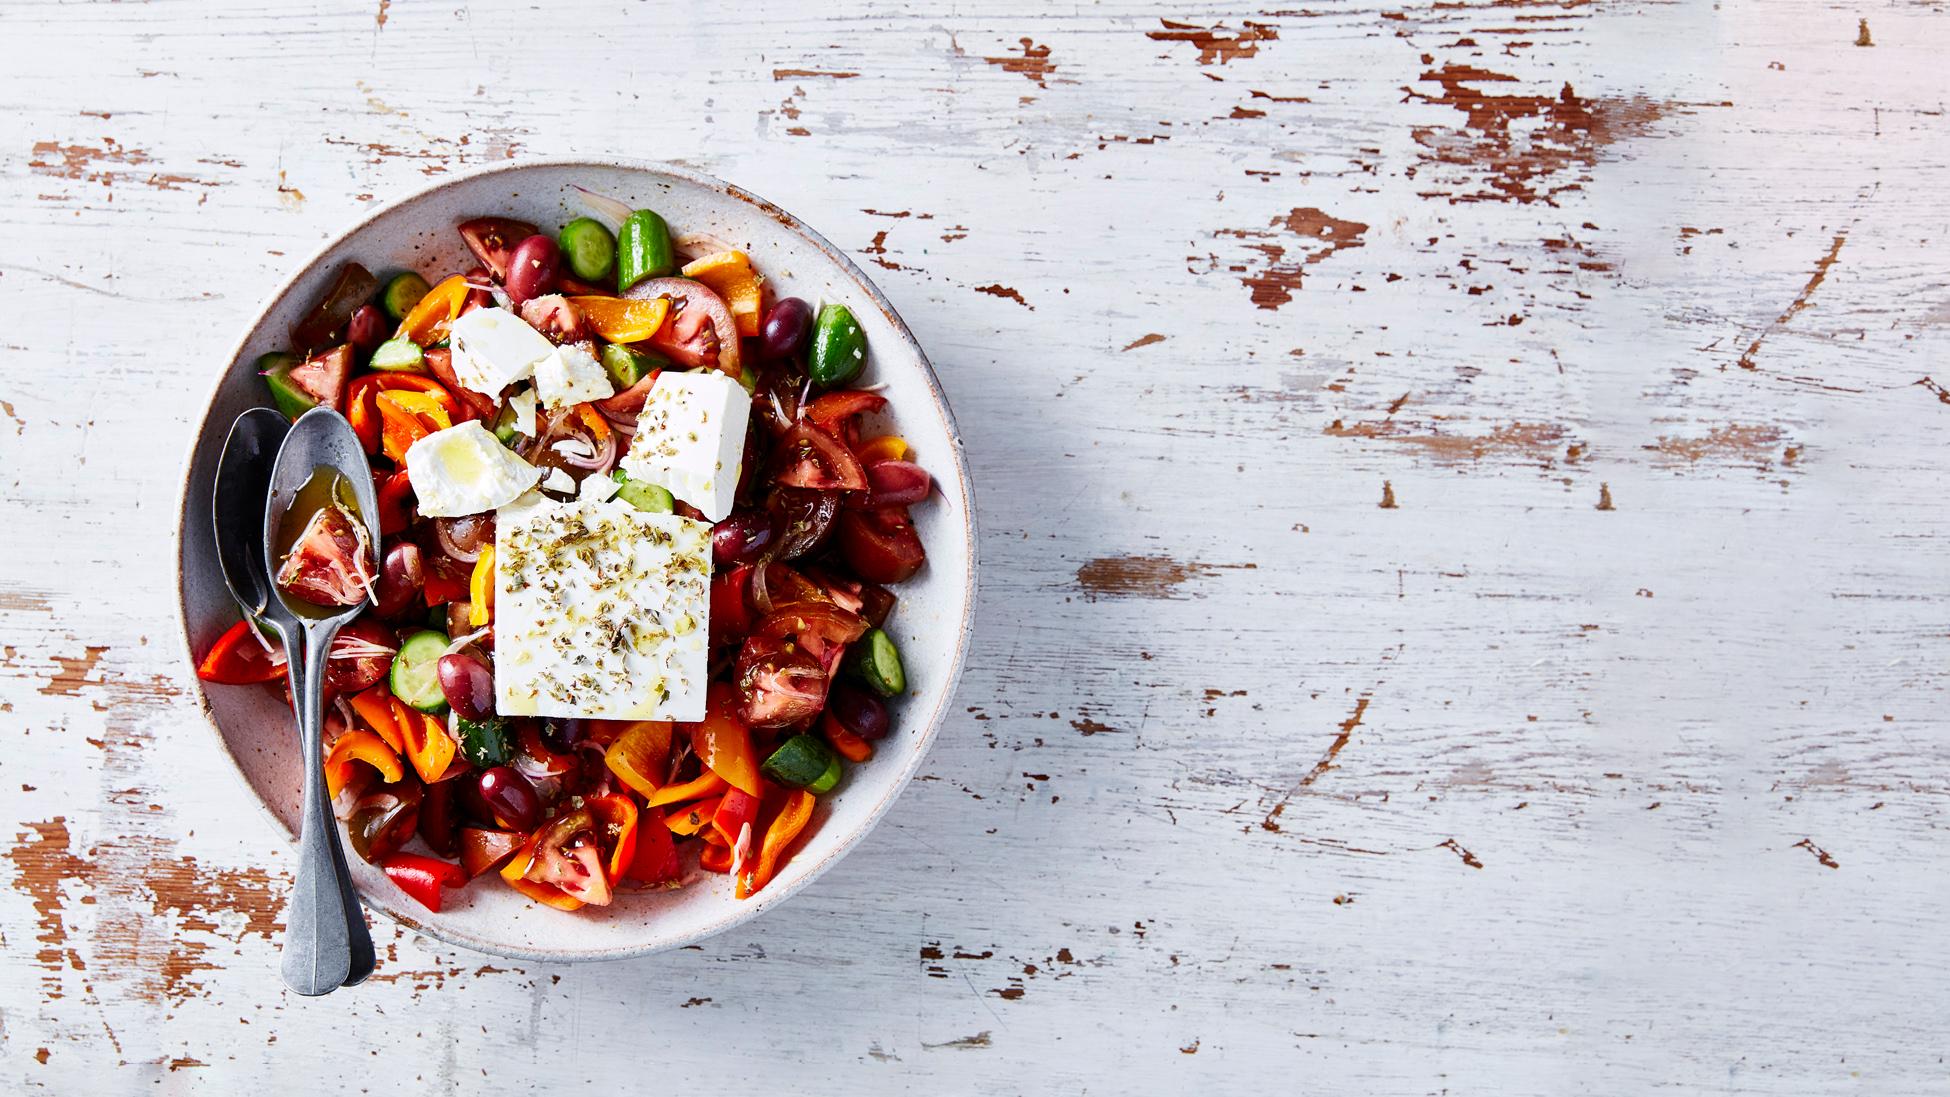 Try Our Kumato Greek Salad Recipe